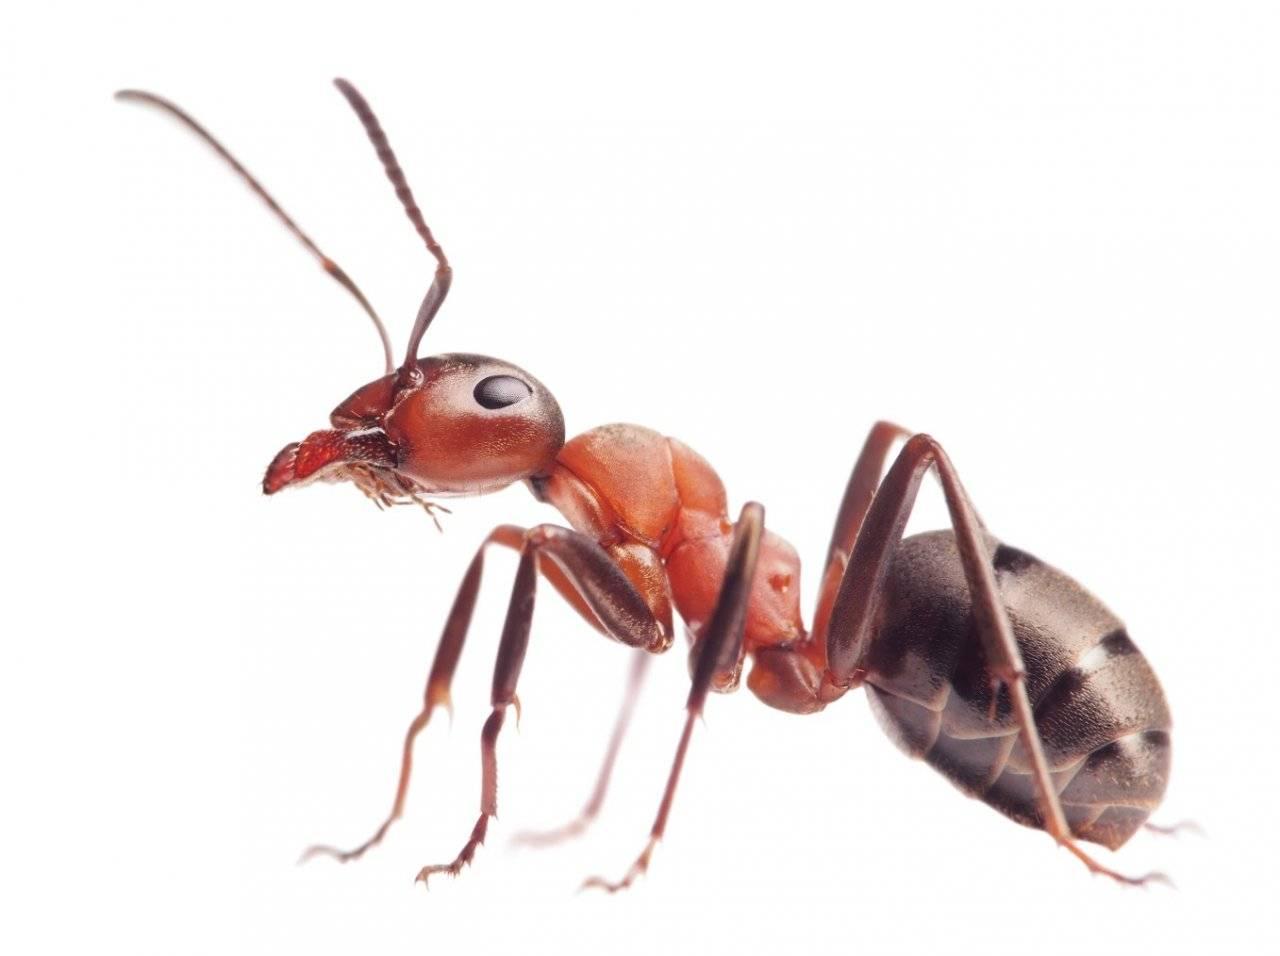 Борьба с муравьями в доме или квартире